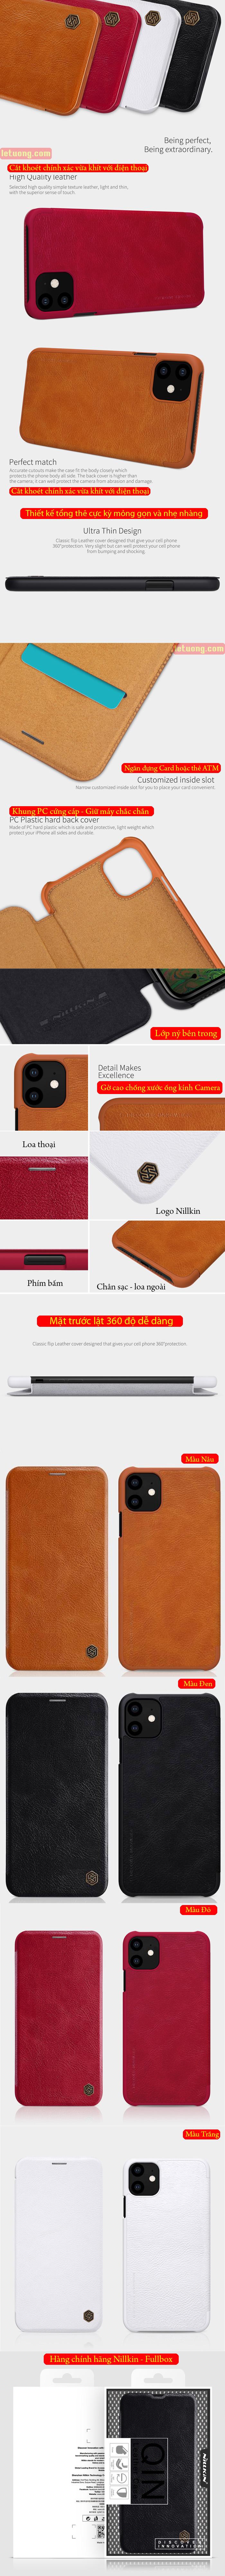 Bao da iPhone 11 Nillkin Qin Leather sang trọng - cổ điển 2